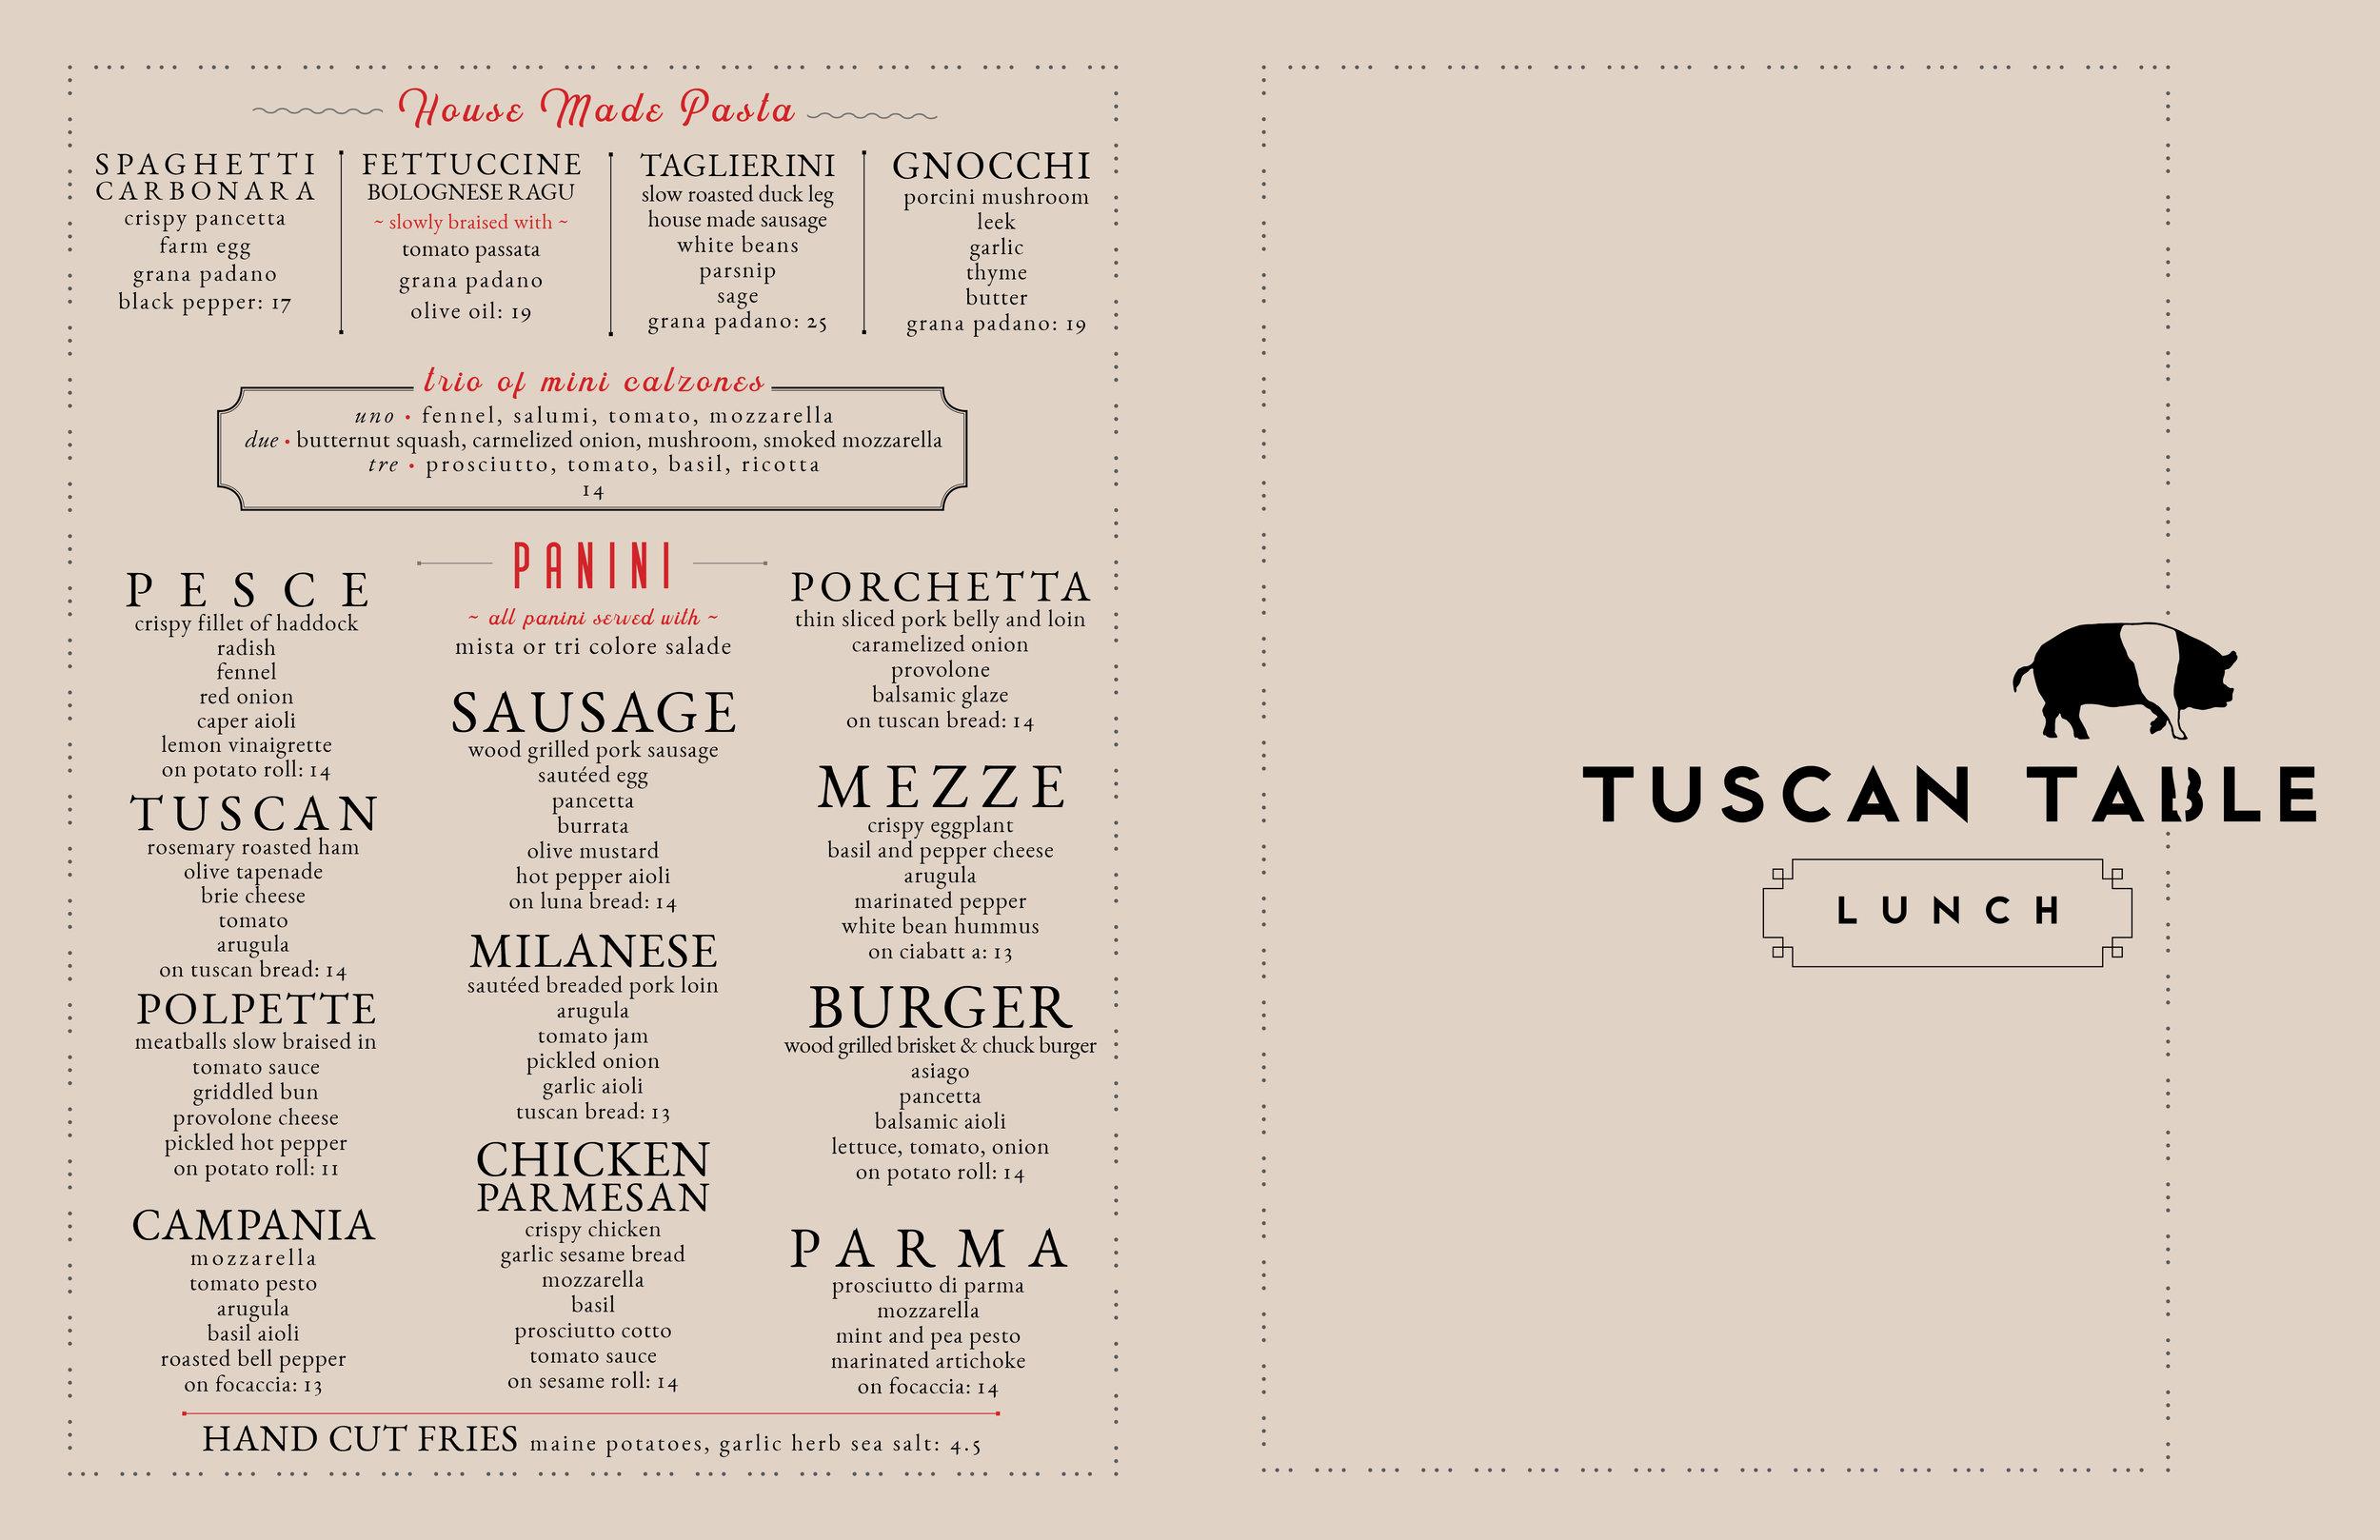 TT-lunch-menu-WEB-Image-12-29.jpg